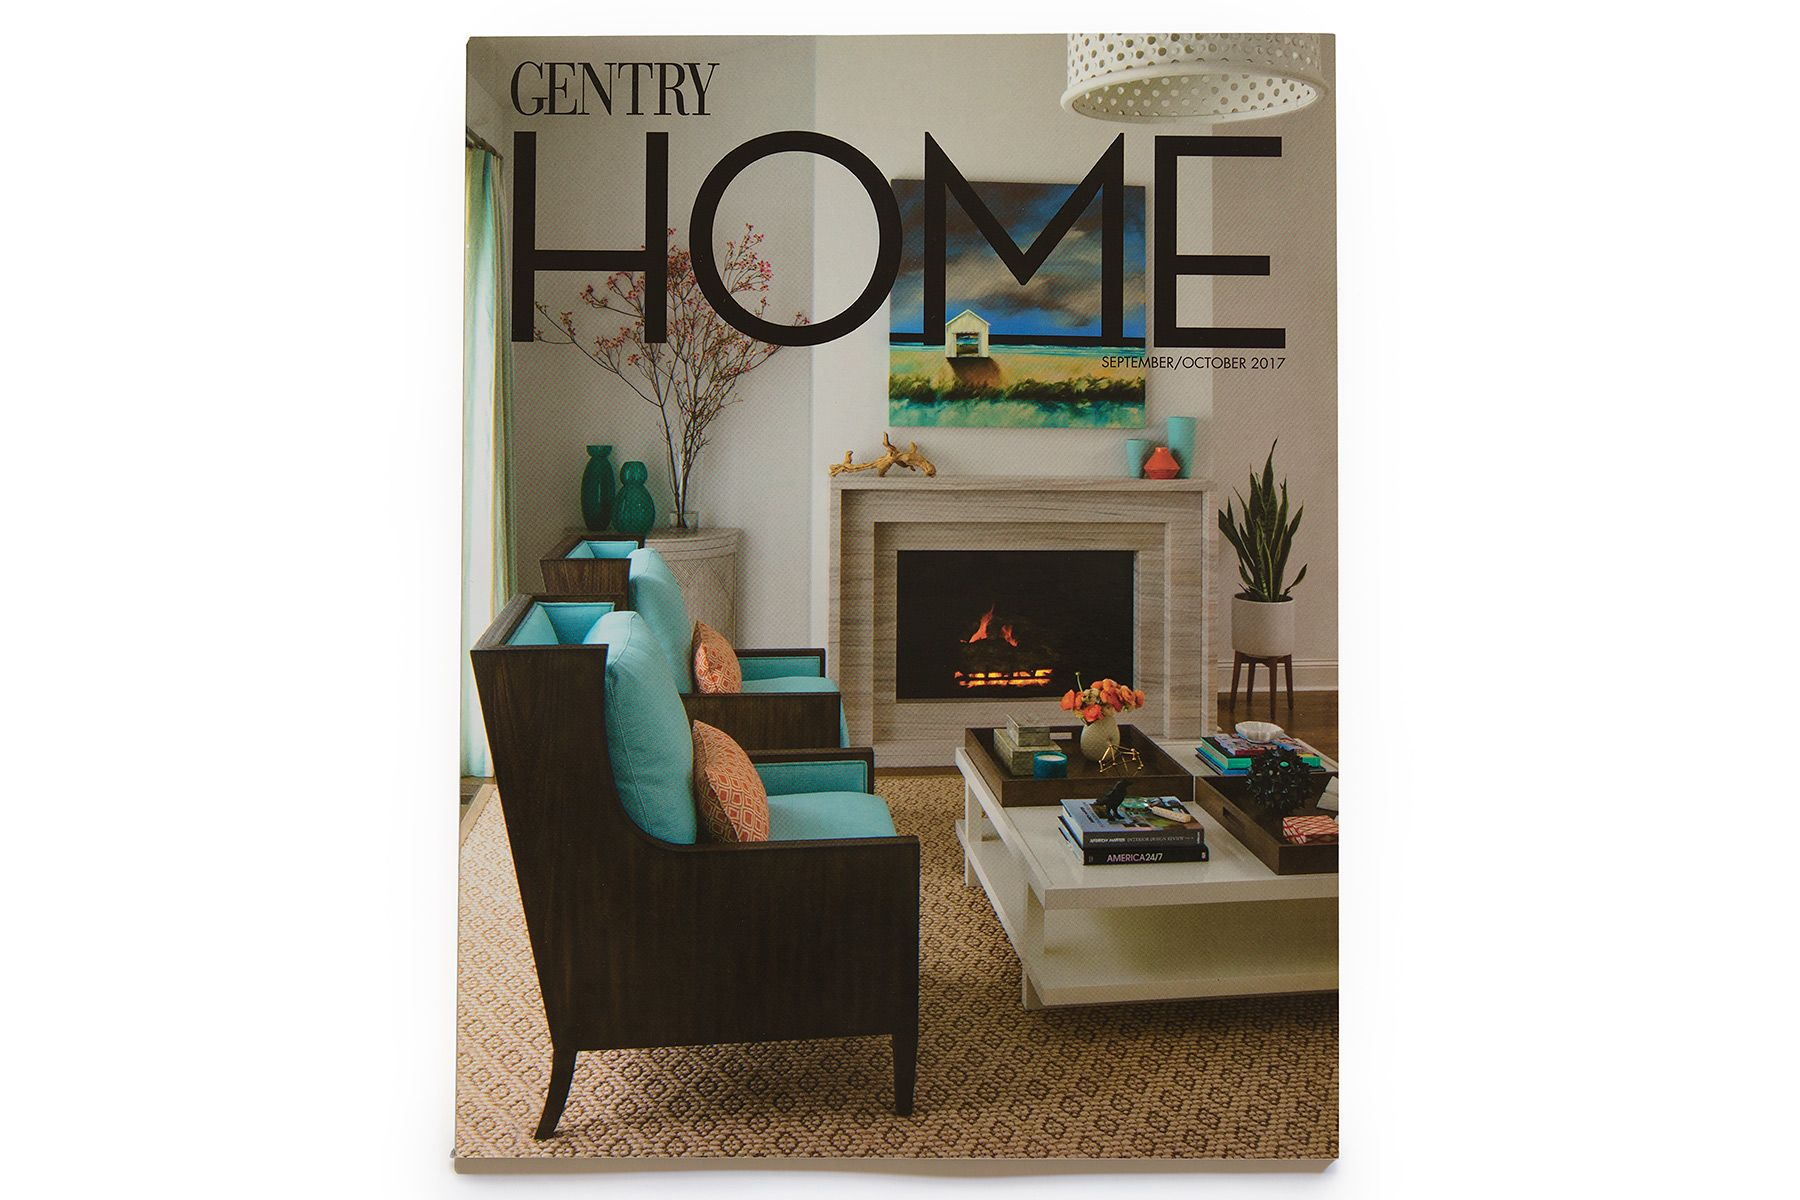 Gentry-Home-Cover-Tineke-10-17L.jpg